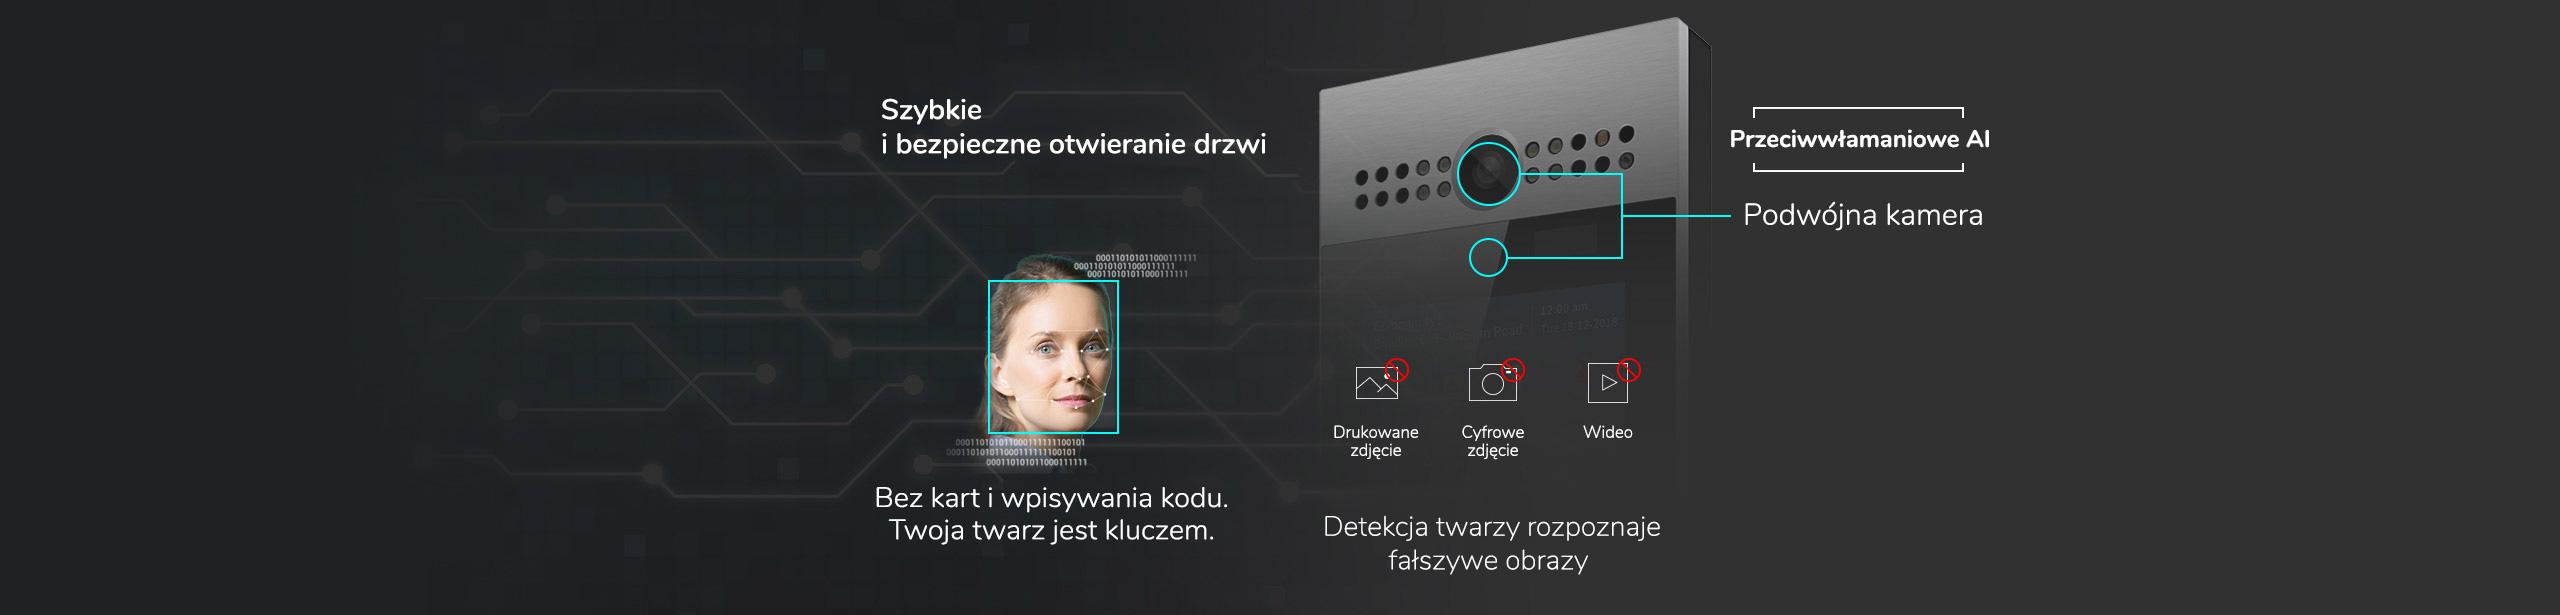 Akuvox R29C detekcja twarzy